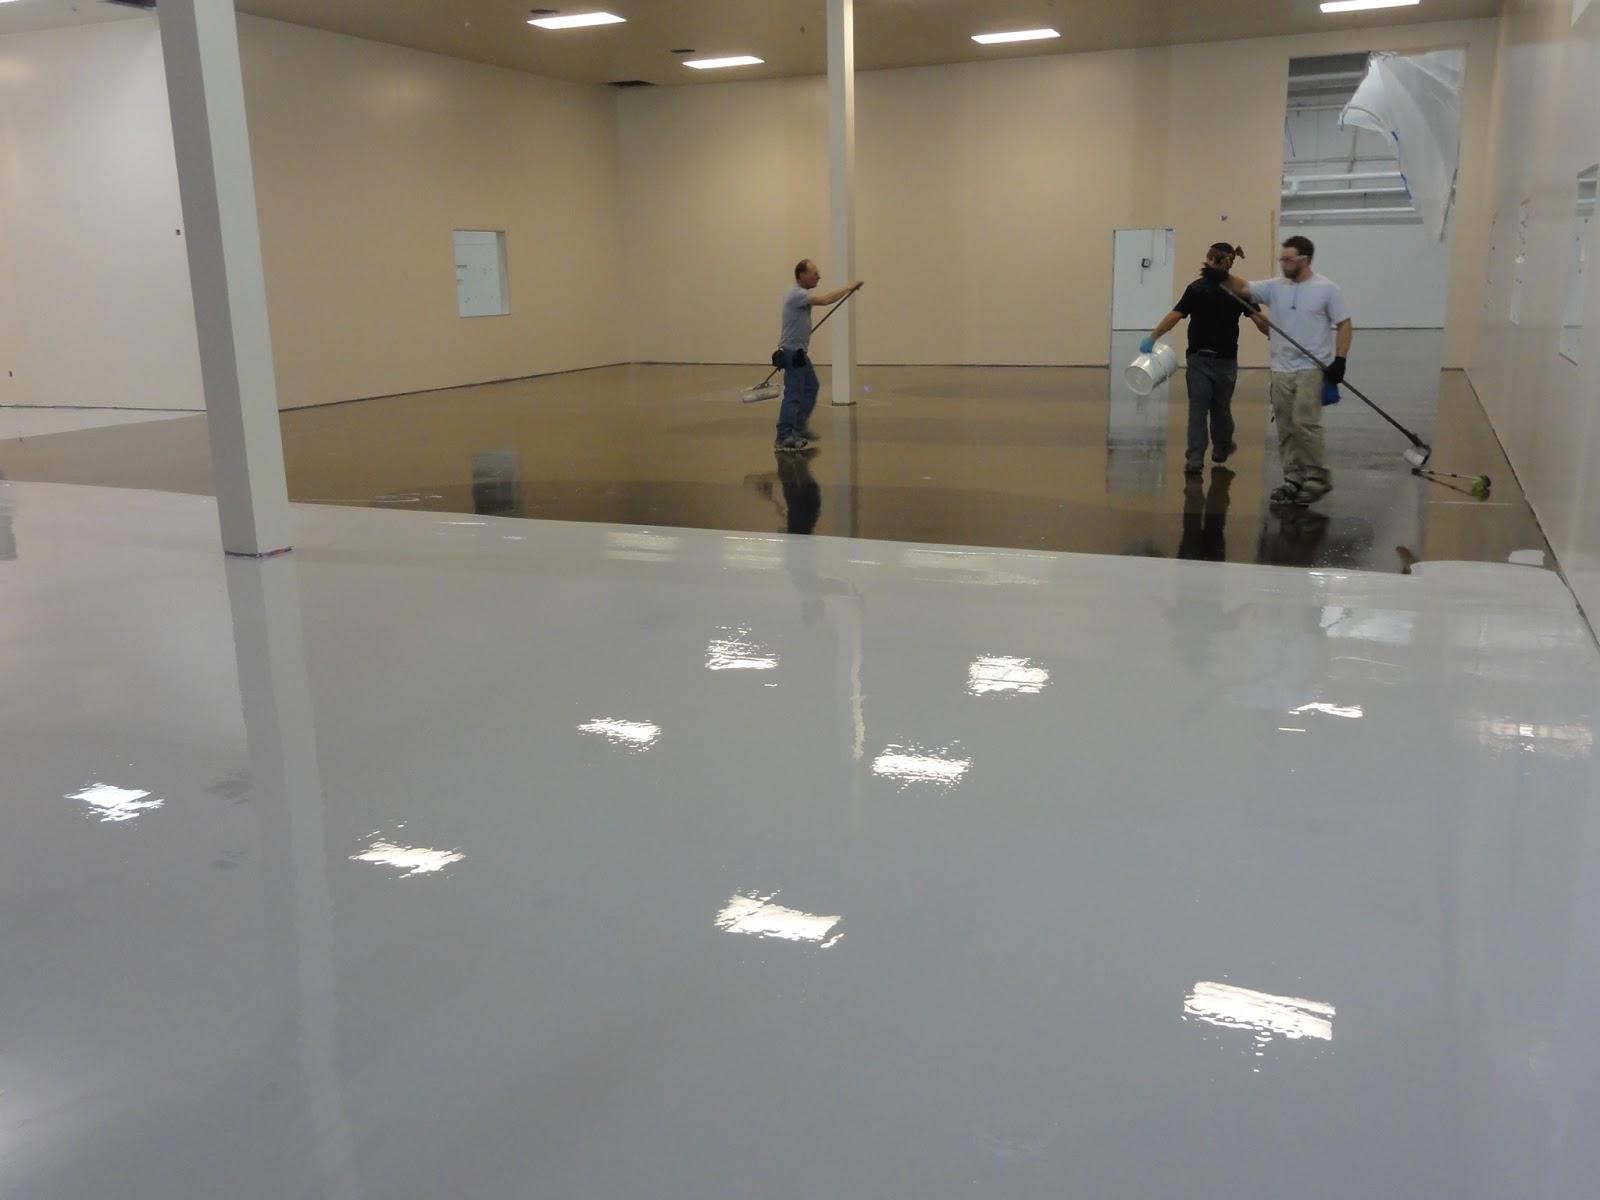 Large Commercial Epoxy Floor Coatings System | Garage floor epoxy